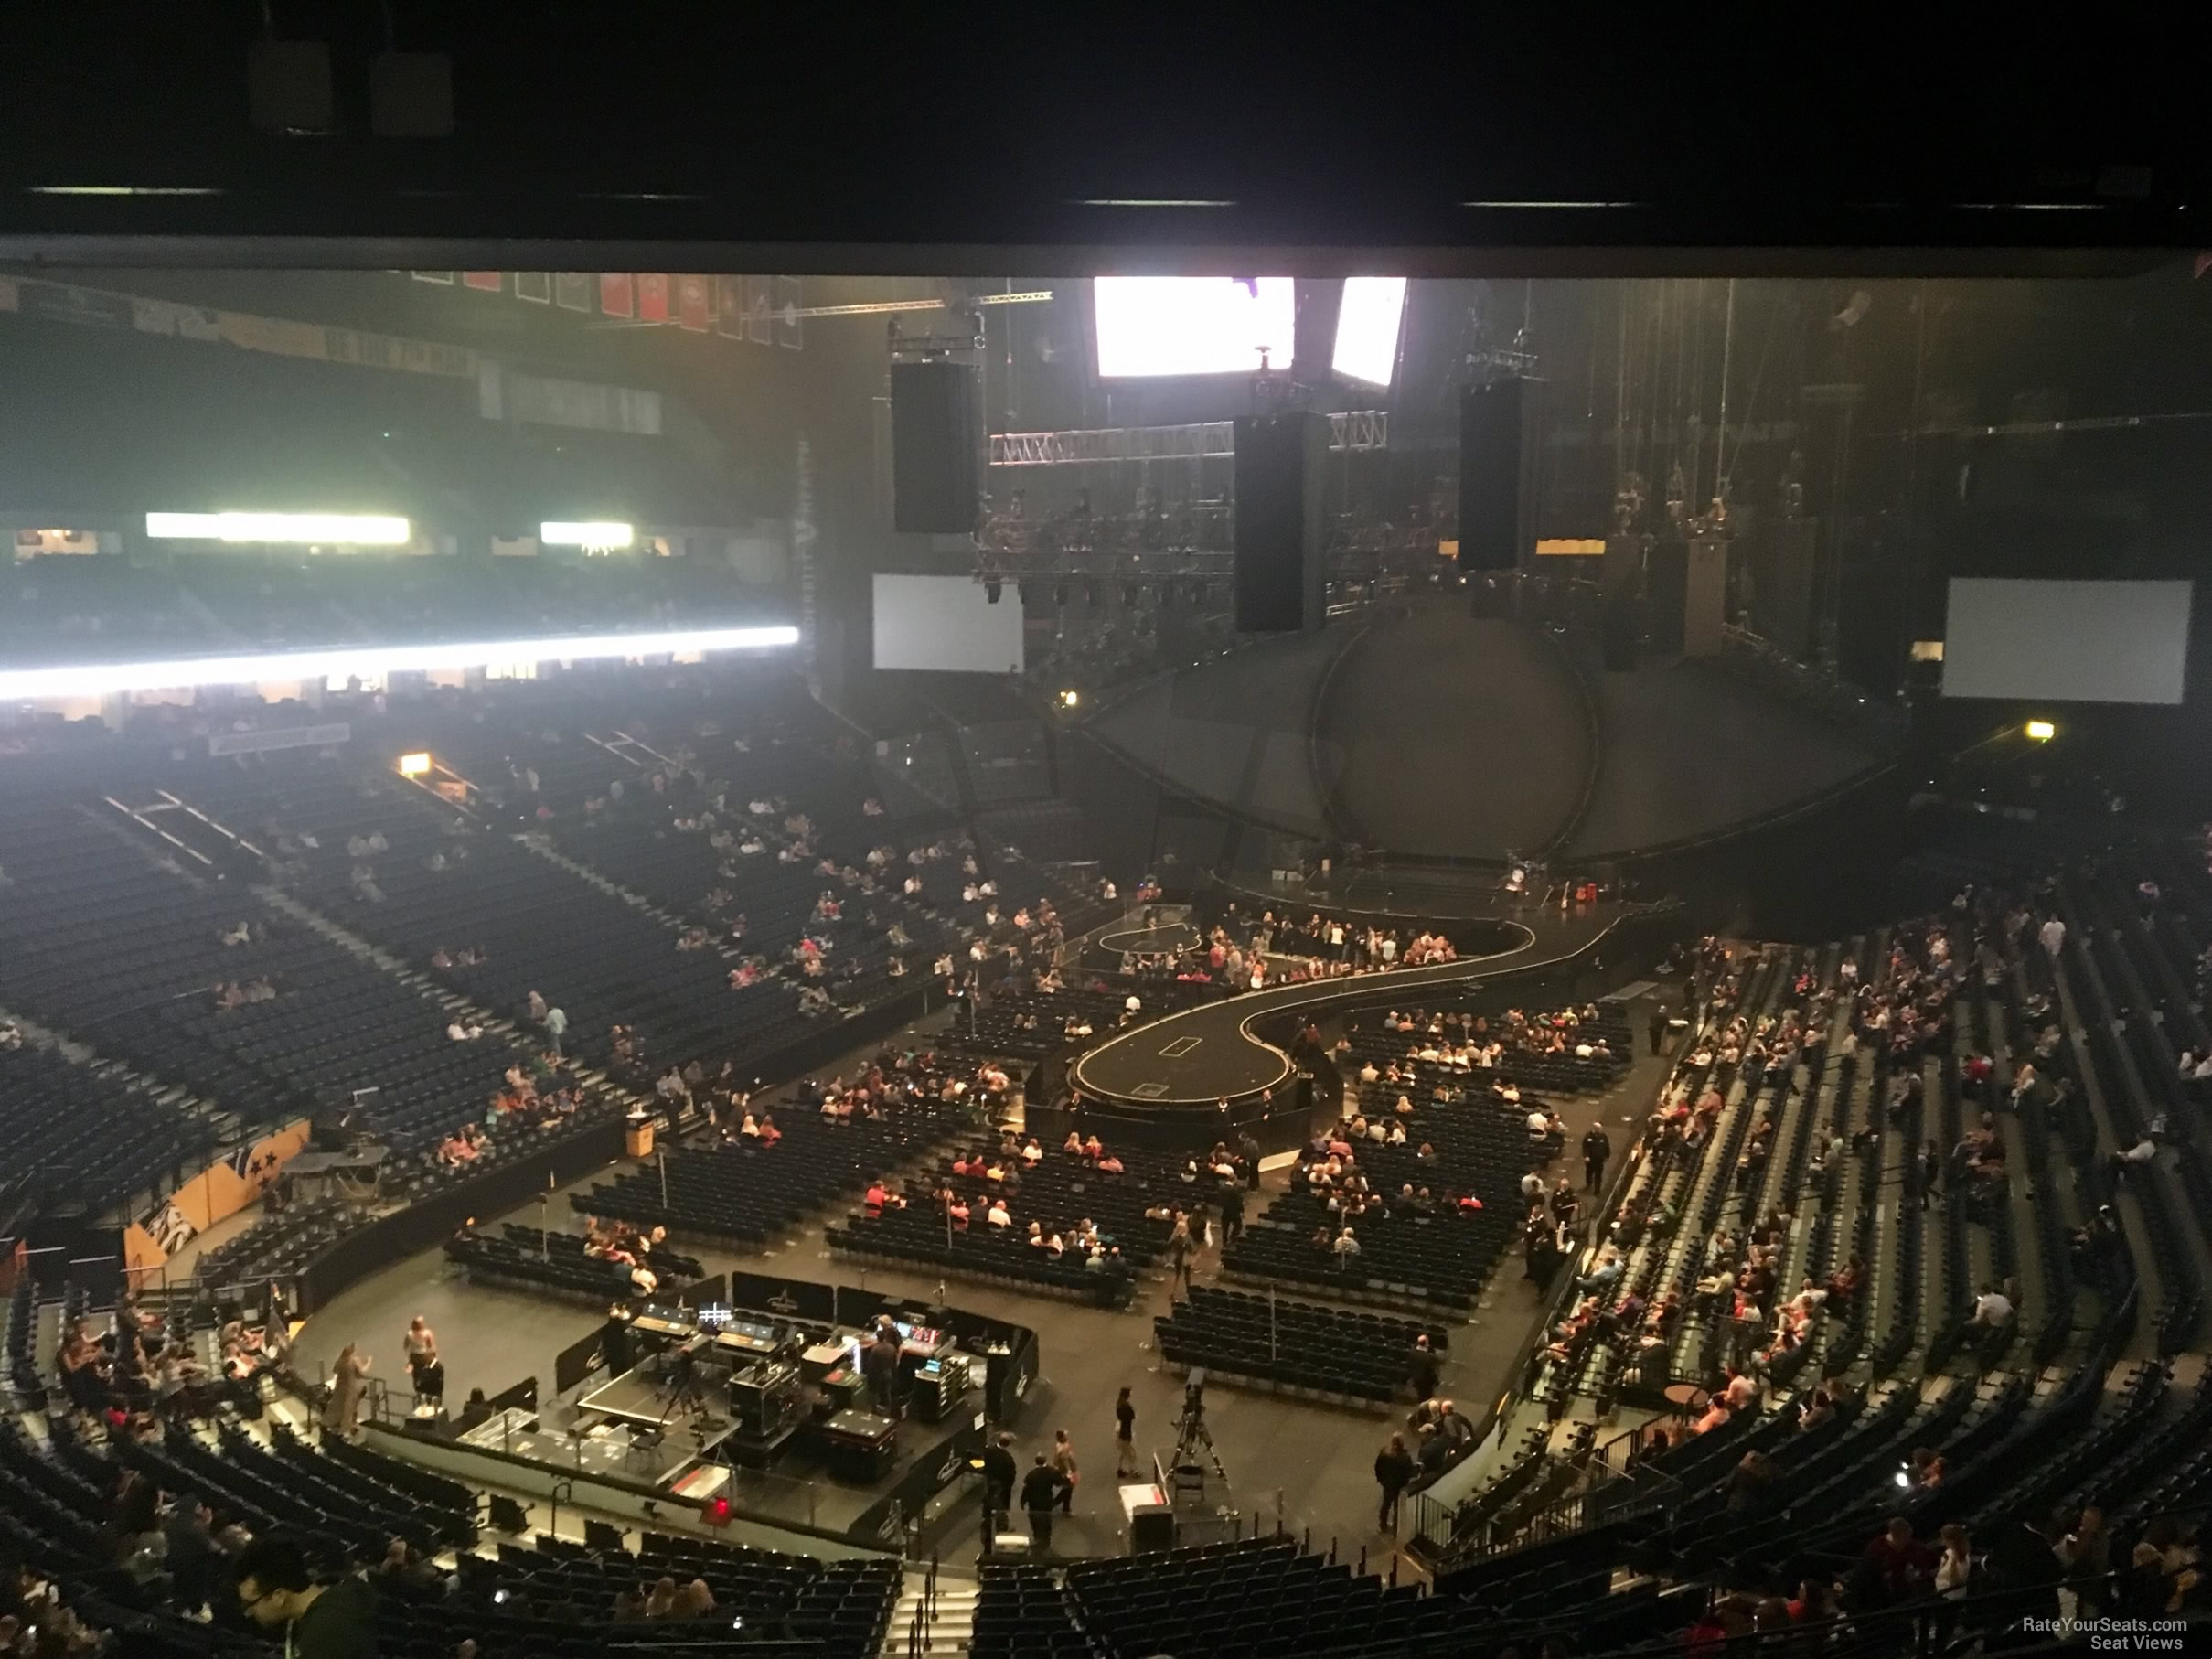 Bridgestone Arena Section 203 Concert Seating